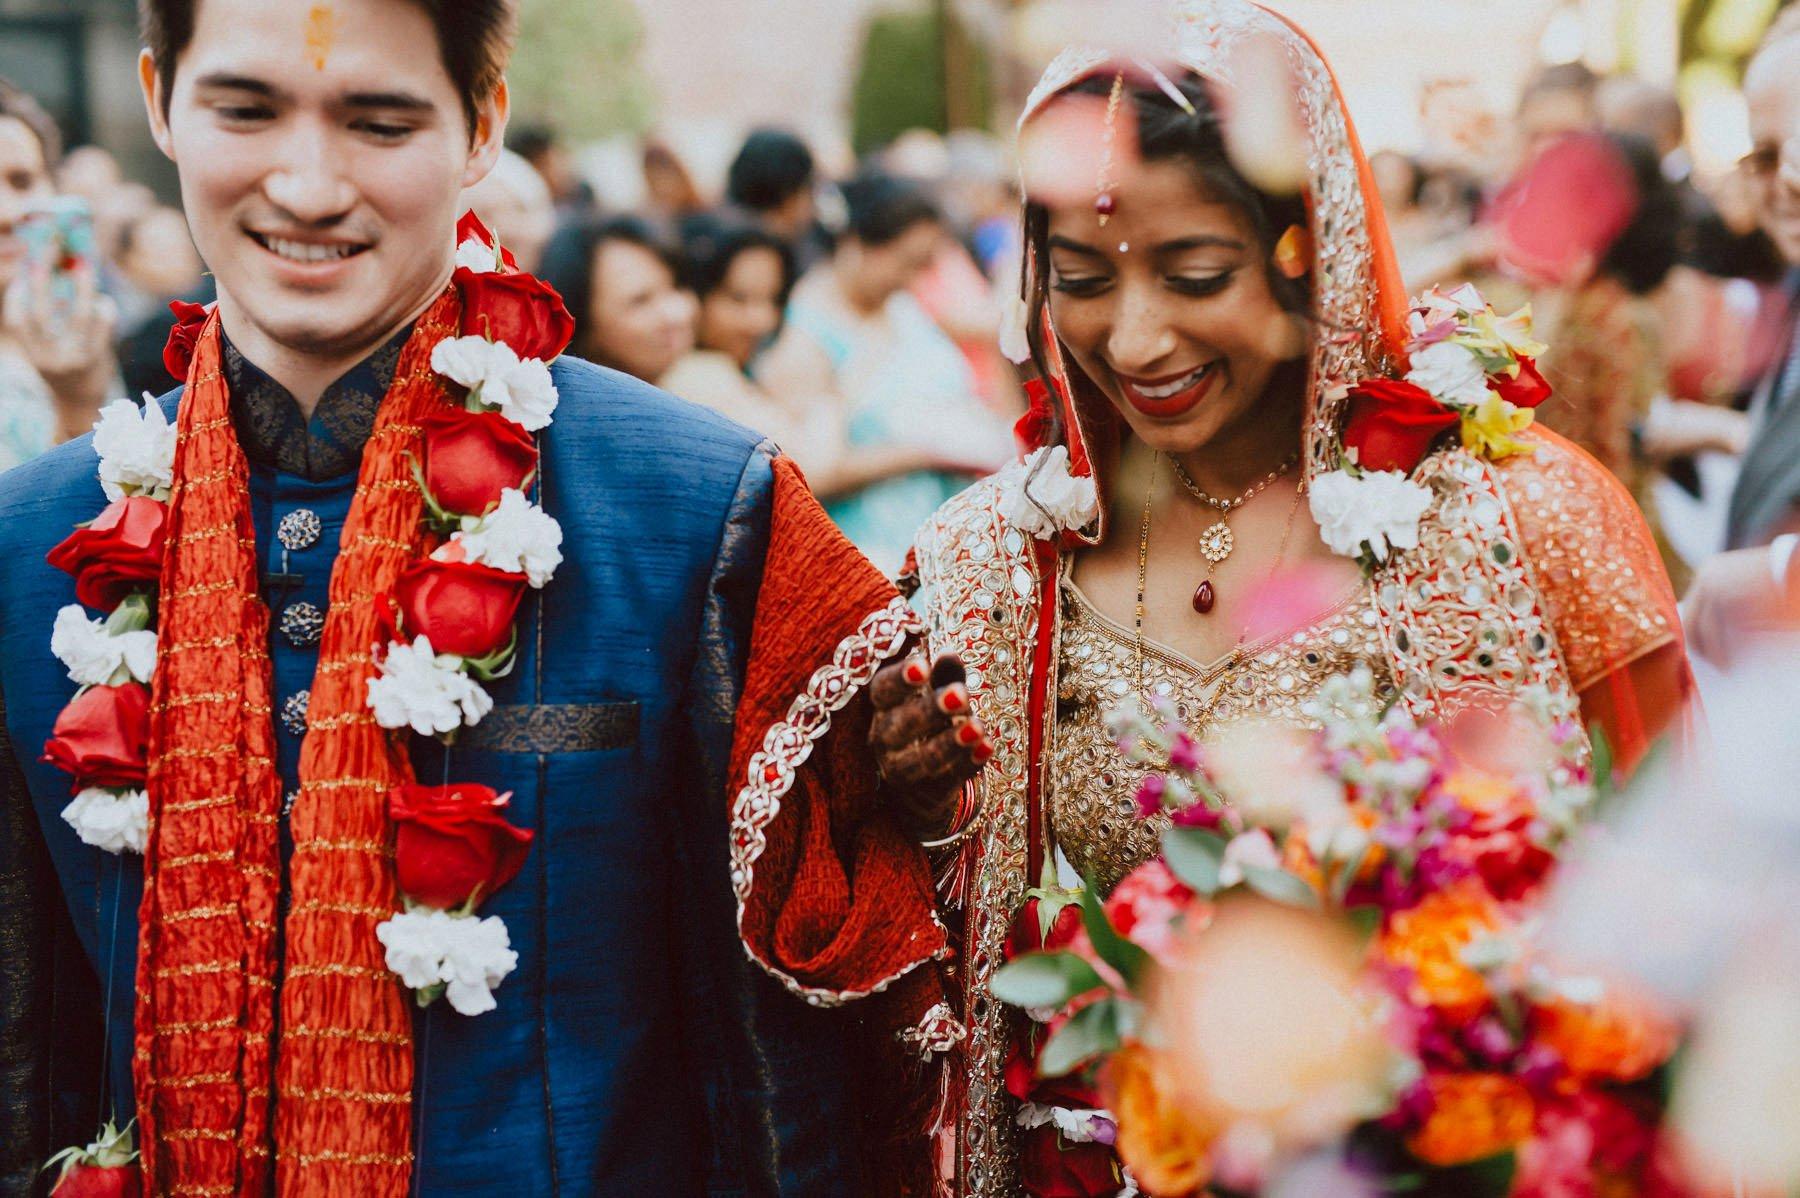 vie-philadelphia-indian-wedding-88.jpg